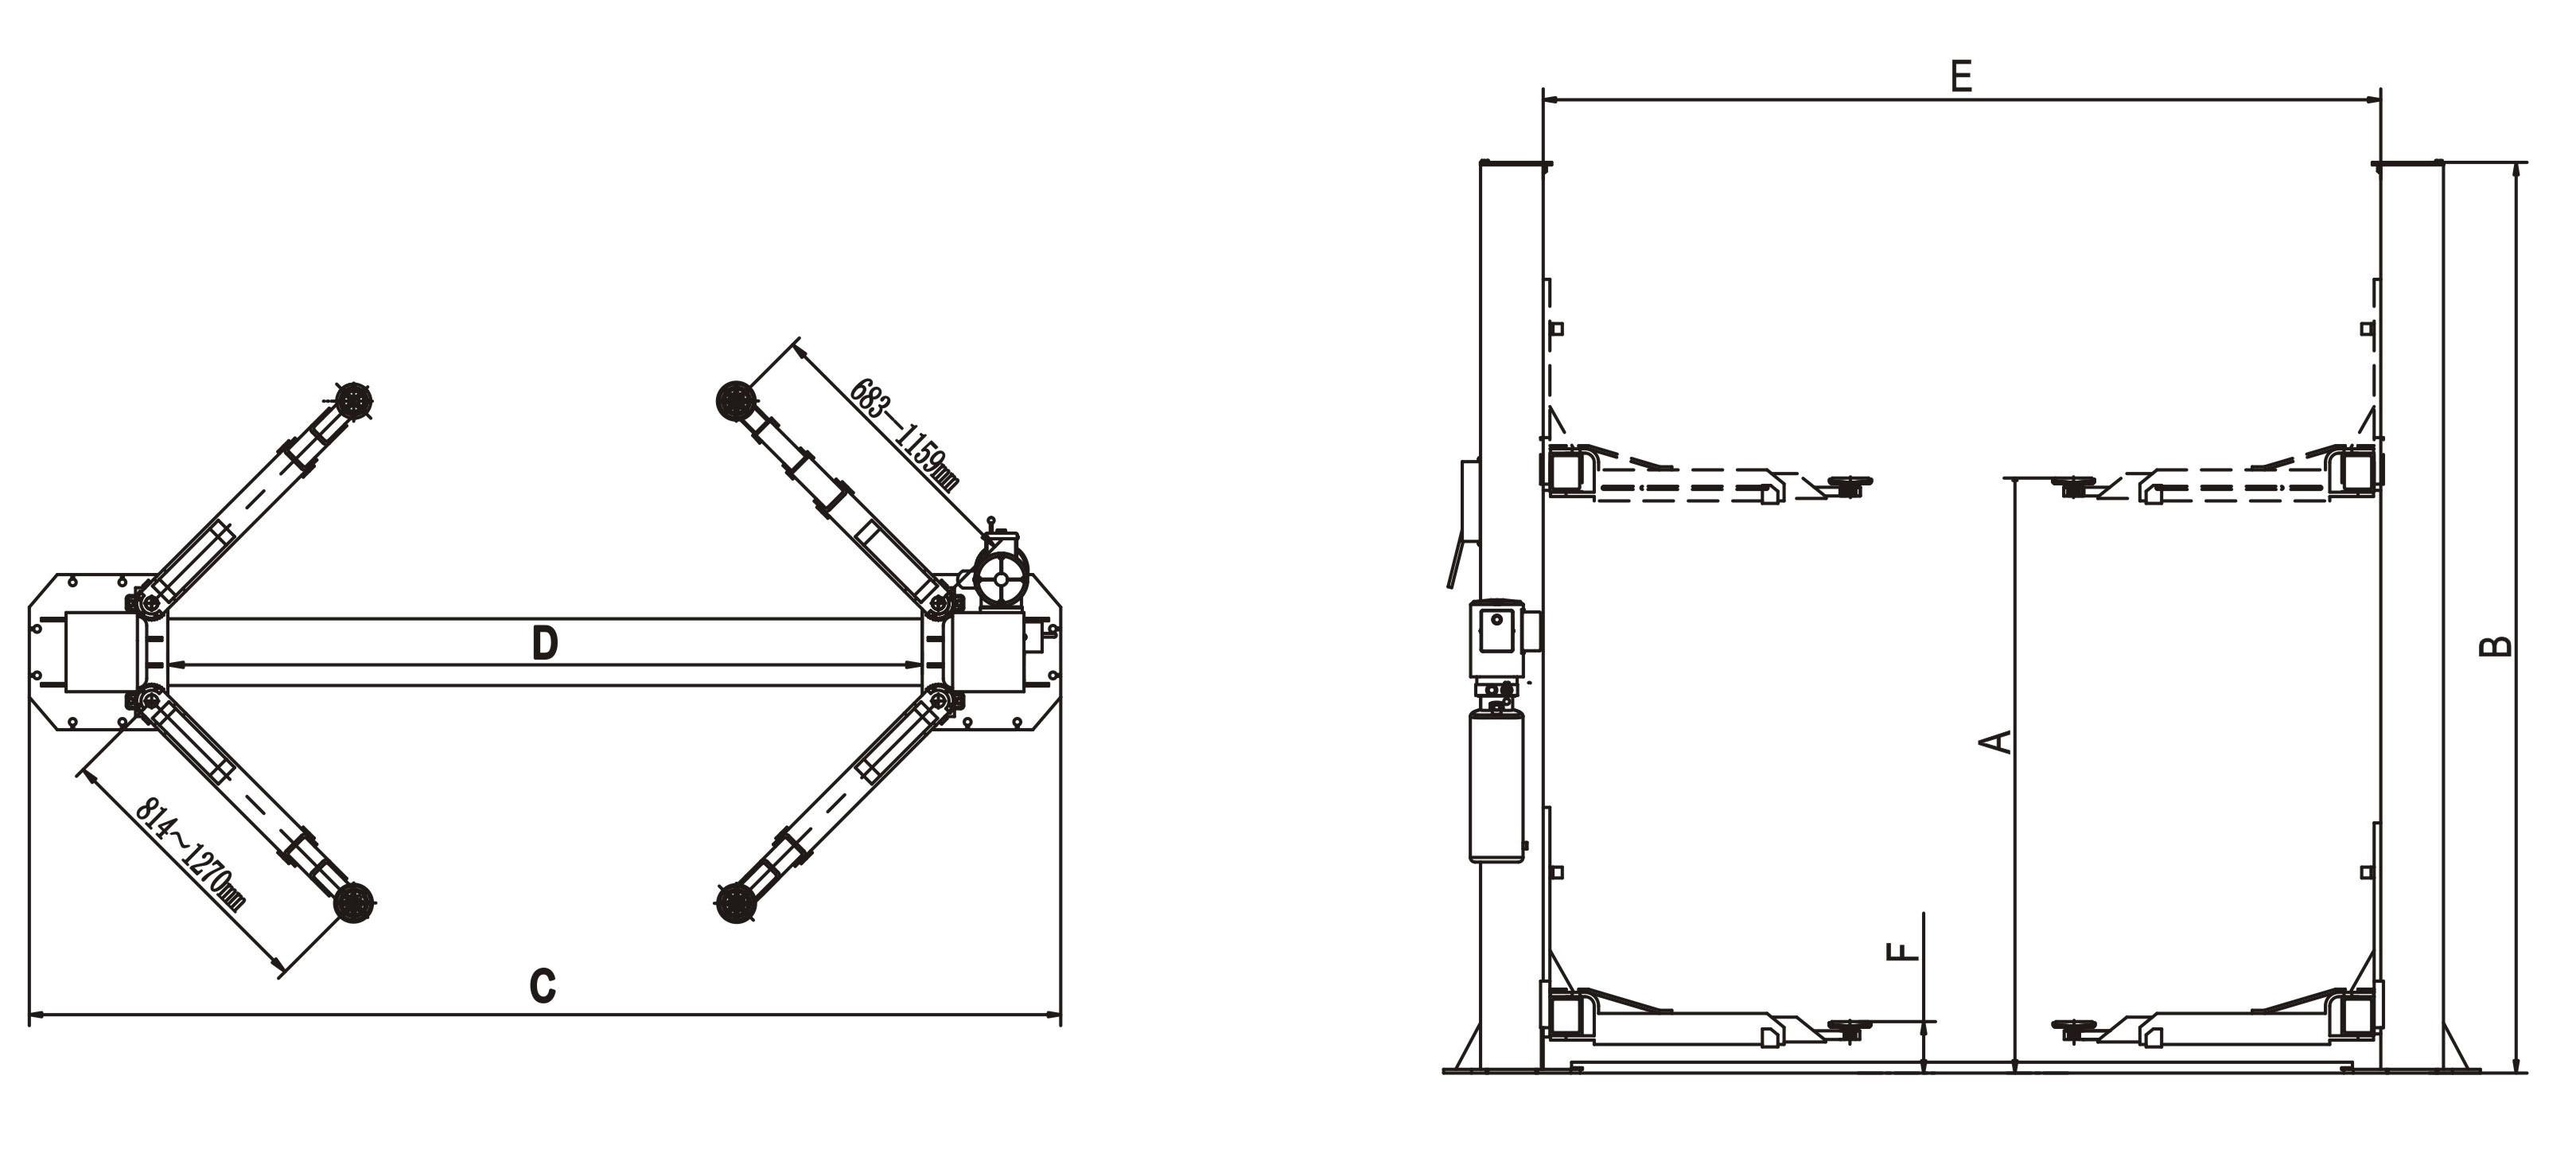 tags: #four post car lift parts#four lift post subterraneancar#economy four  post lift#four post car lift garage living#four post lift truck#four post